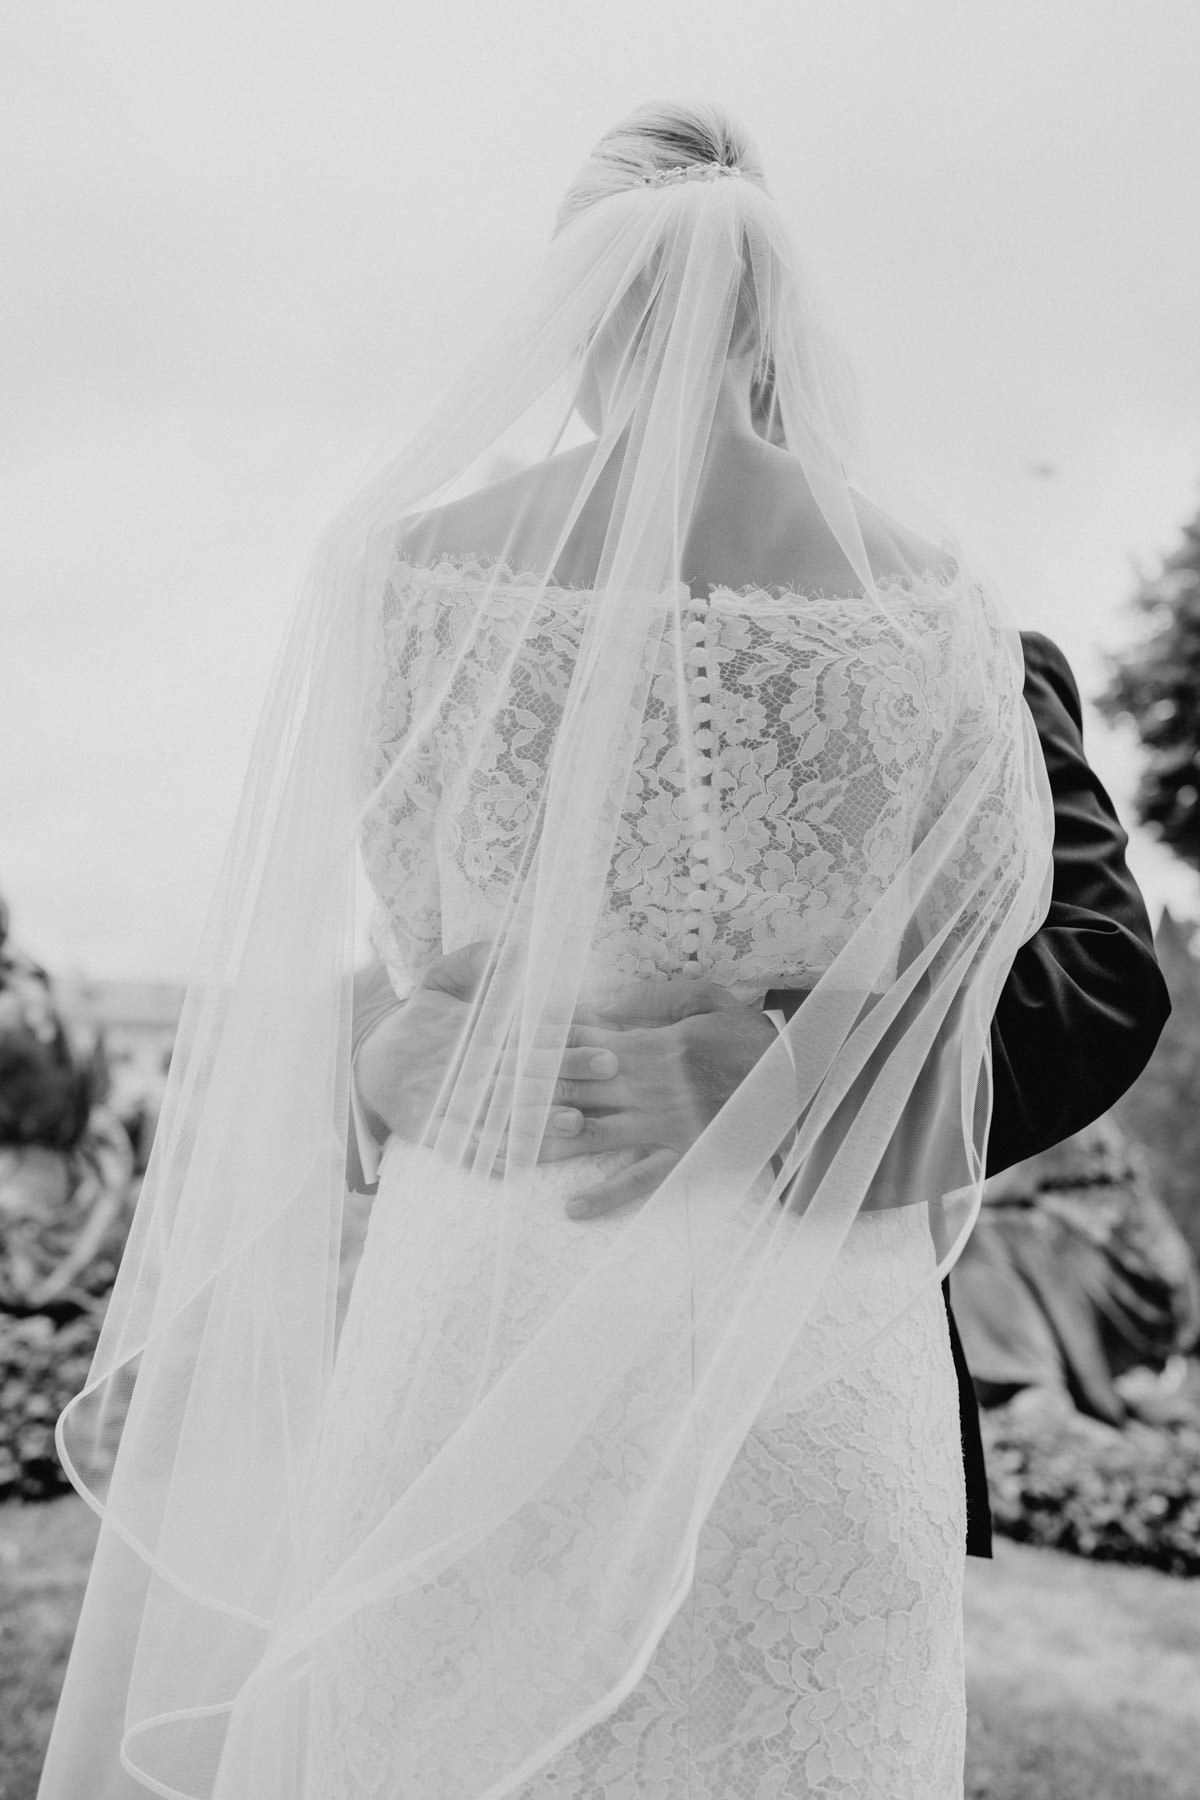 Professionelle Fotografie von Braut und Braeutigam